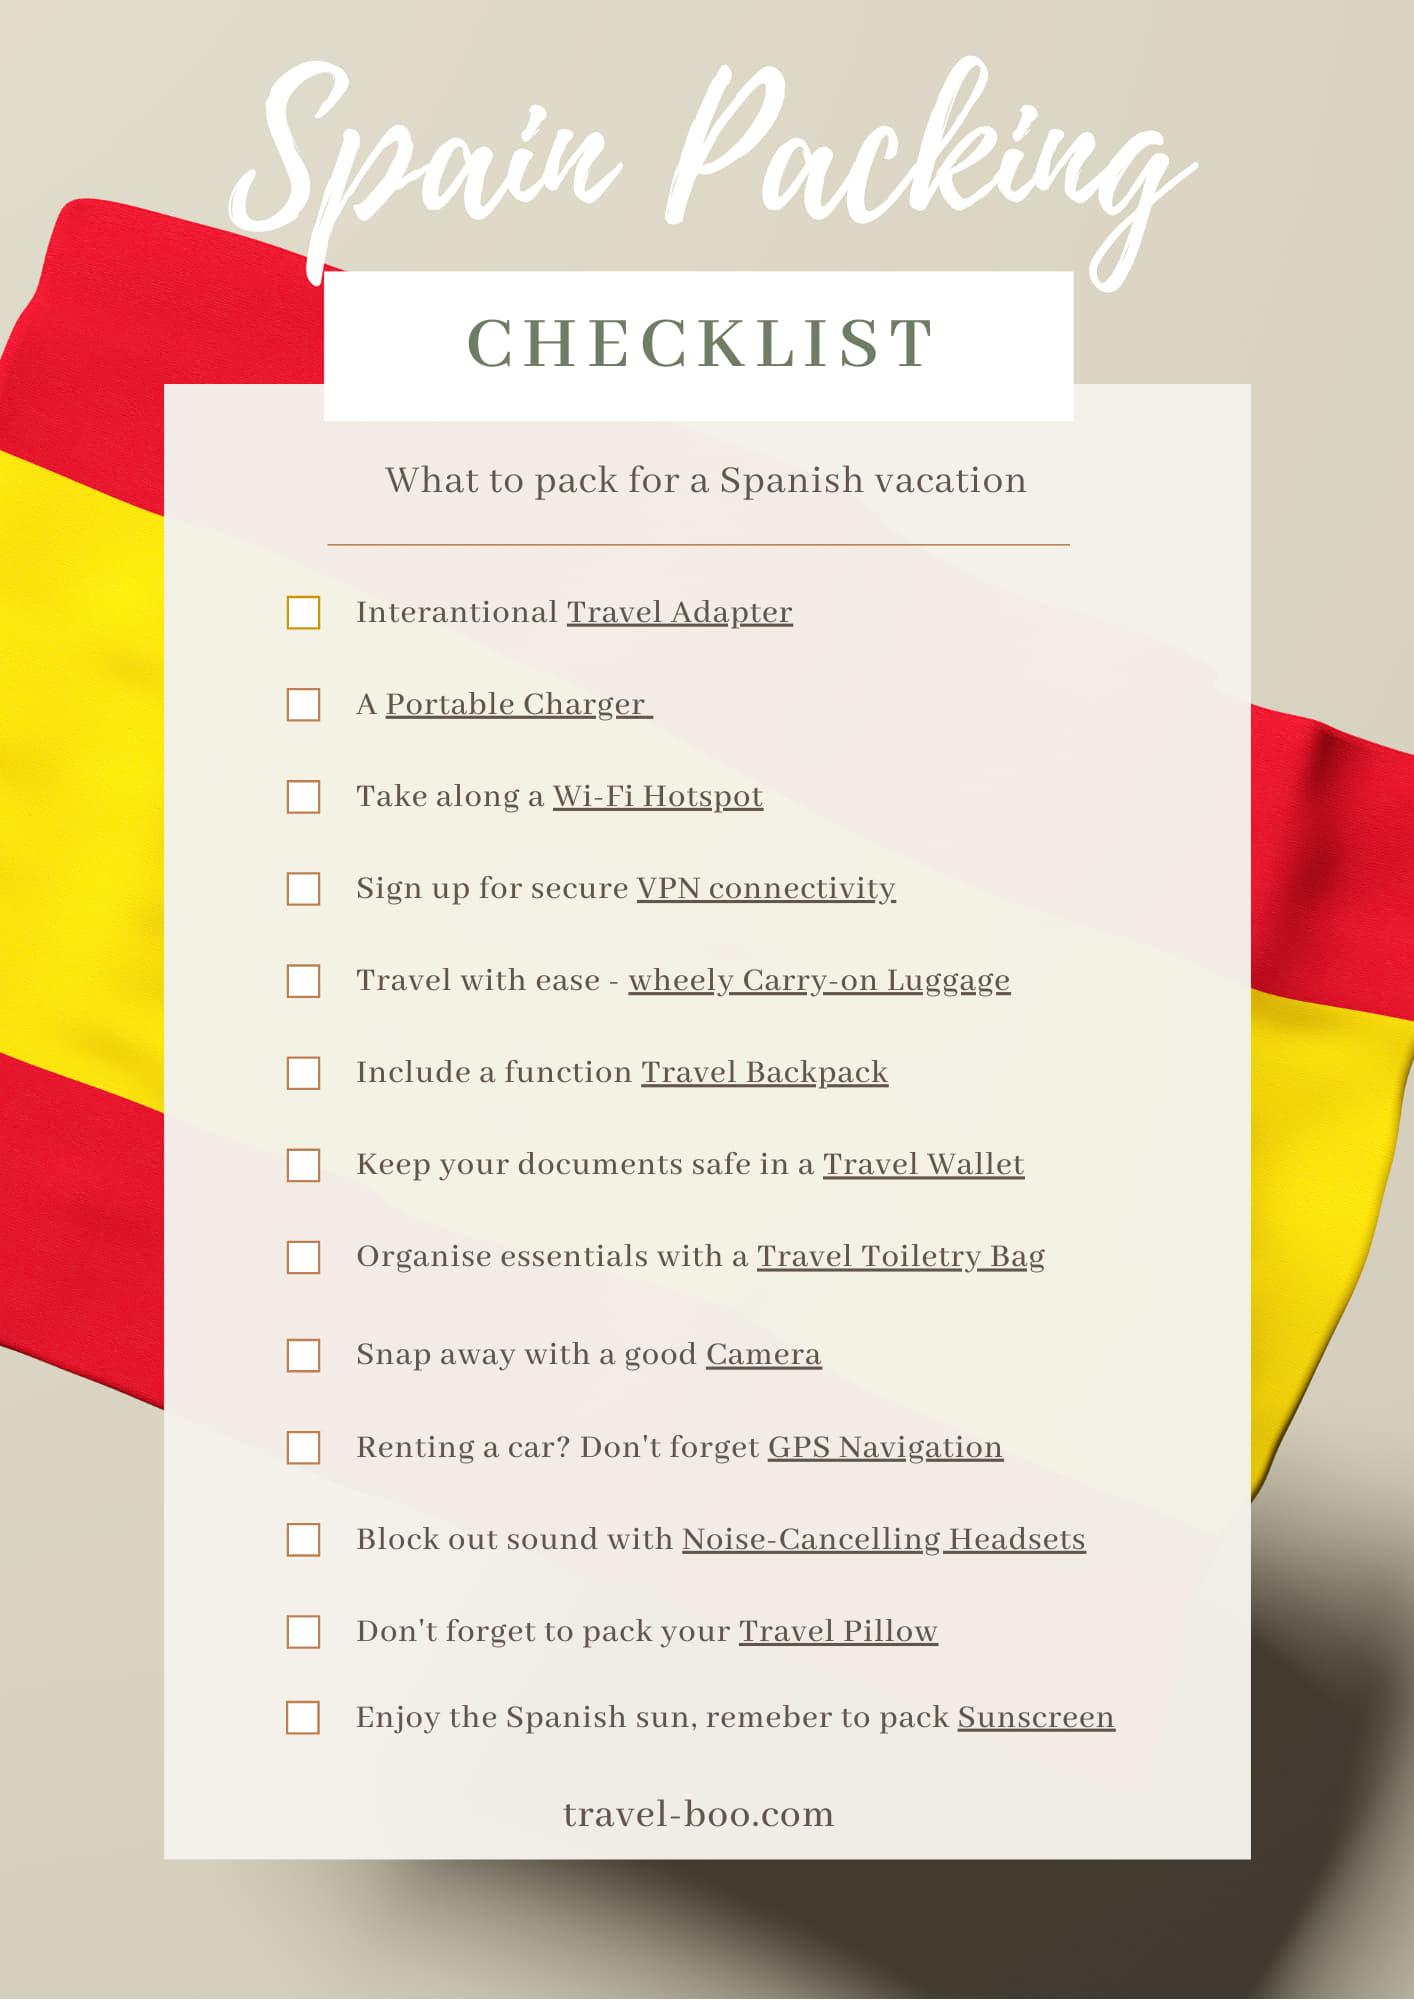 Spain Packing Checklist